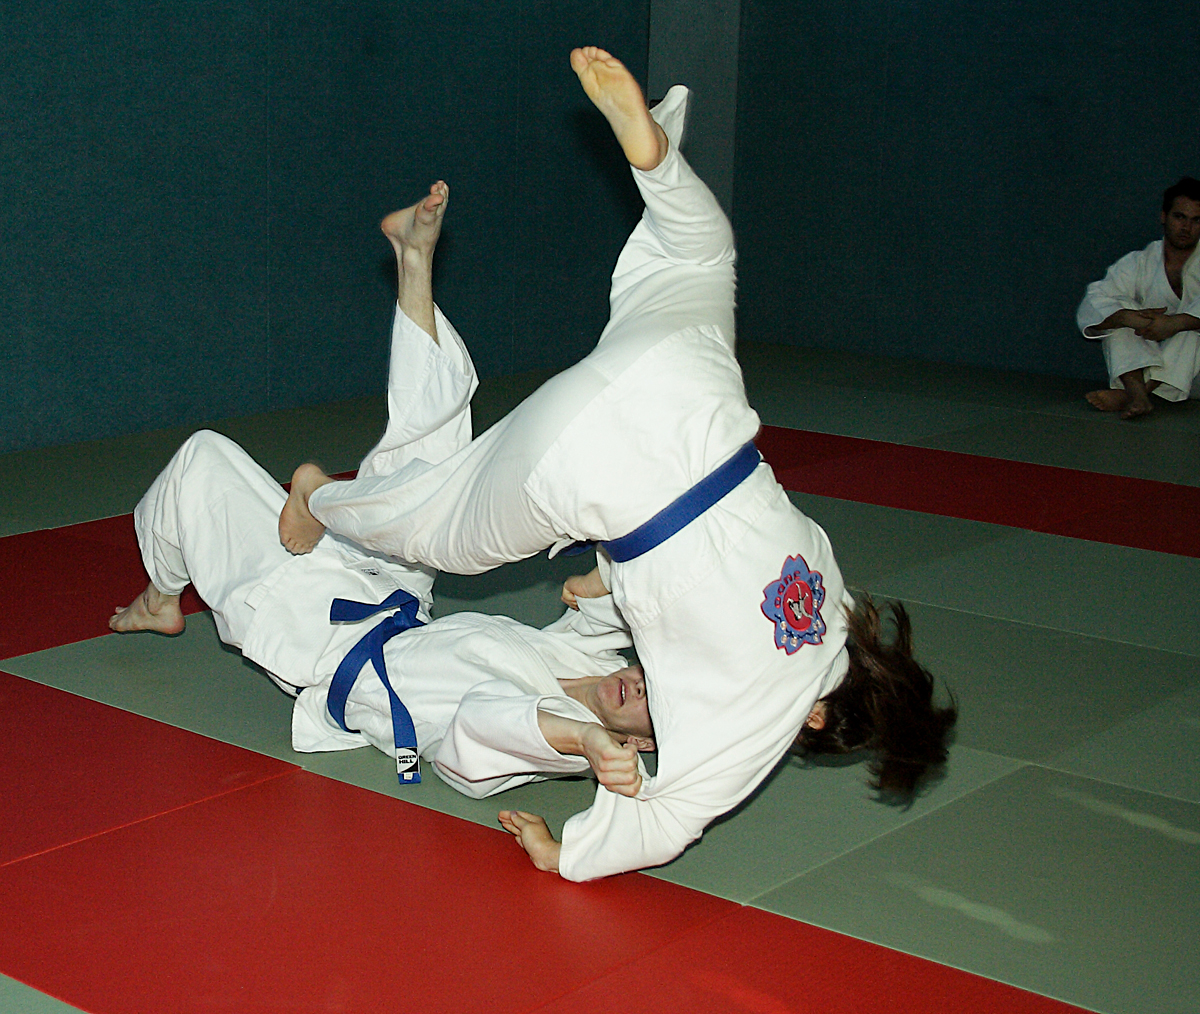 Prüfung zum 1. Kyū - Juni 2019